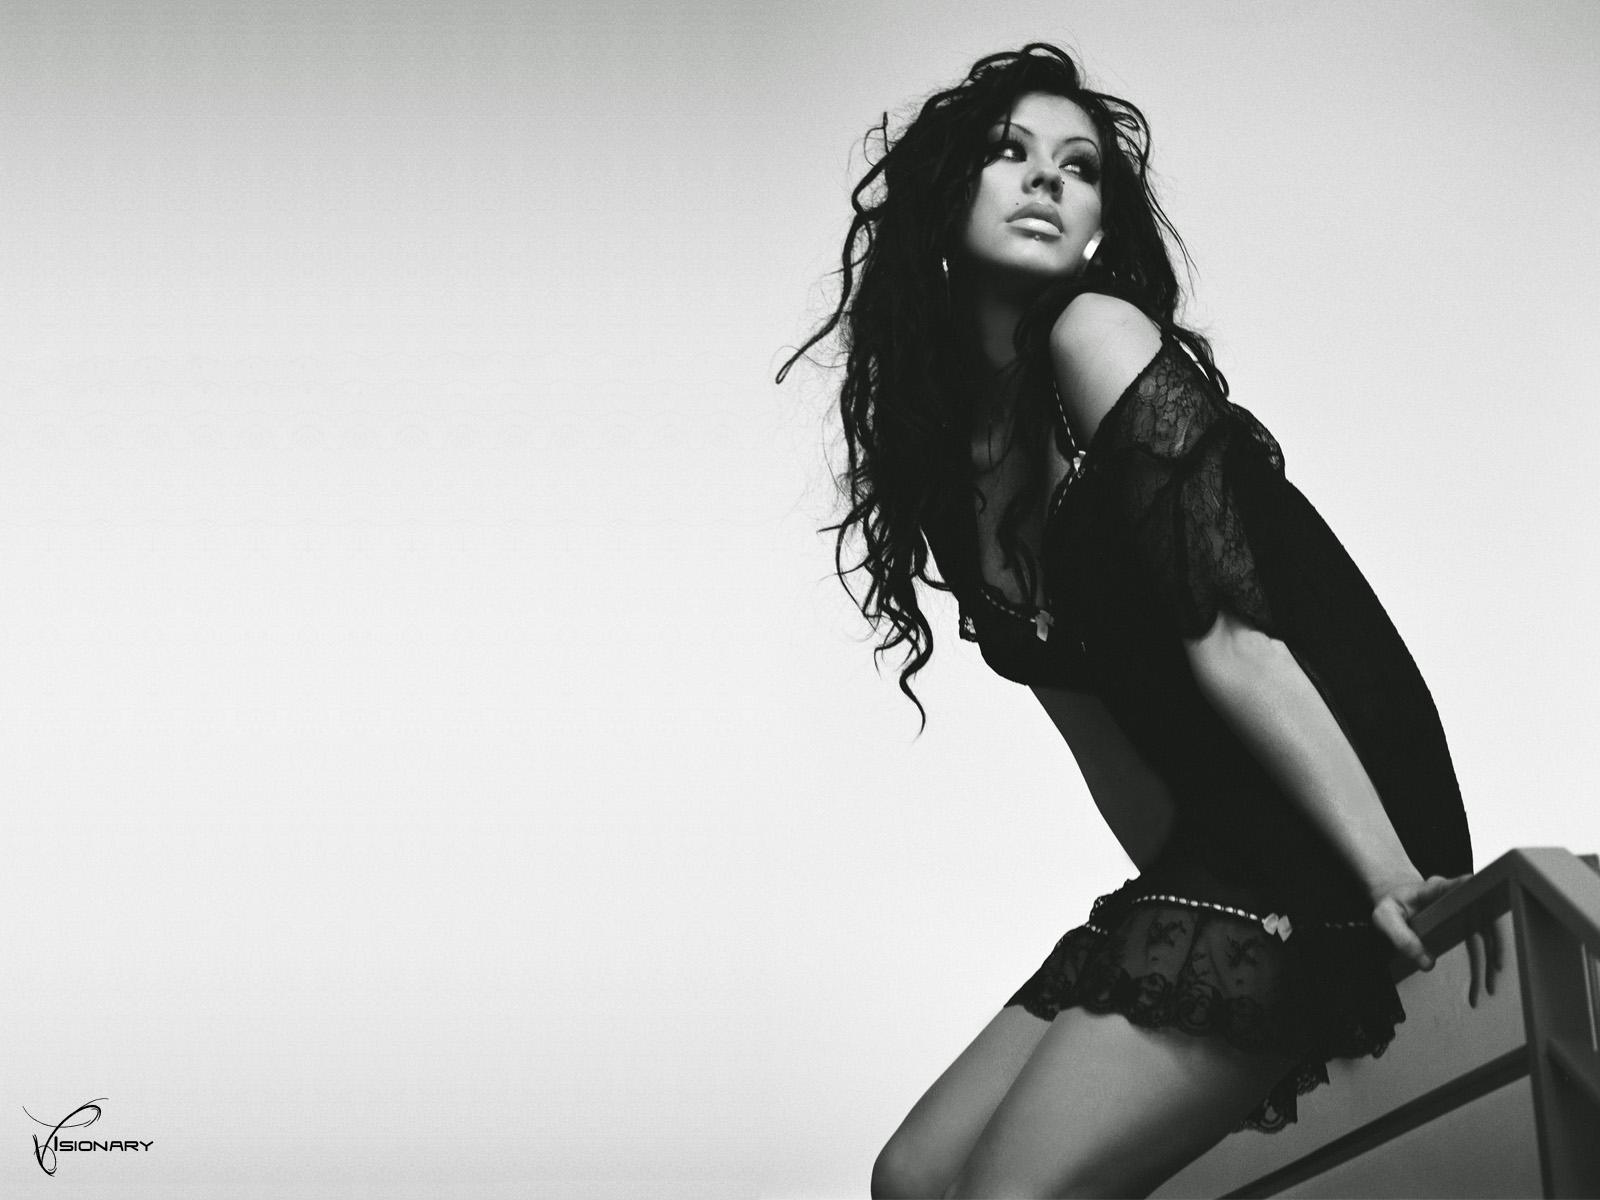 Christina Aguilera Music Celebrities Girls f wallpaper